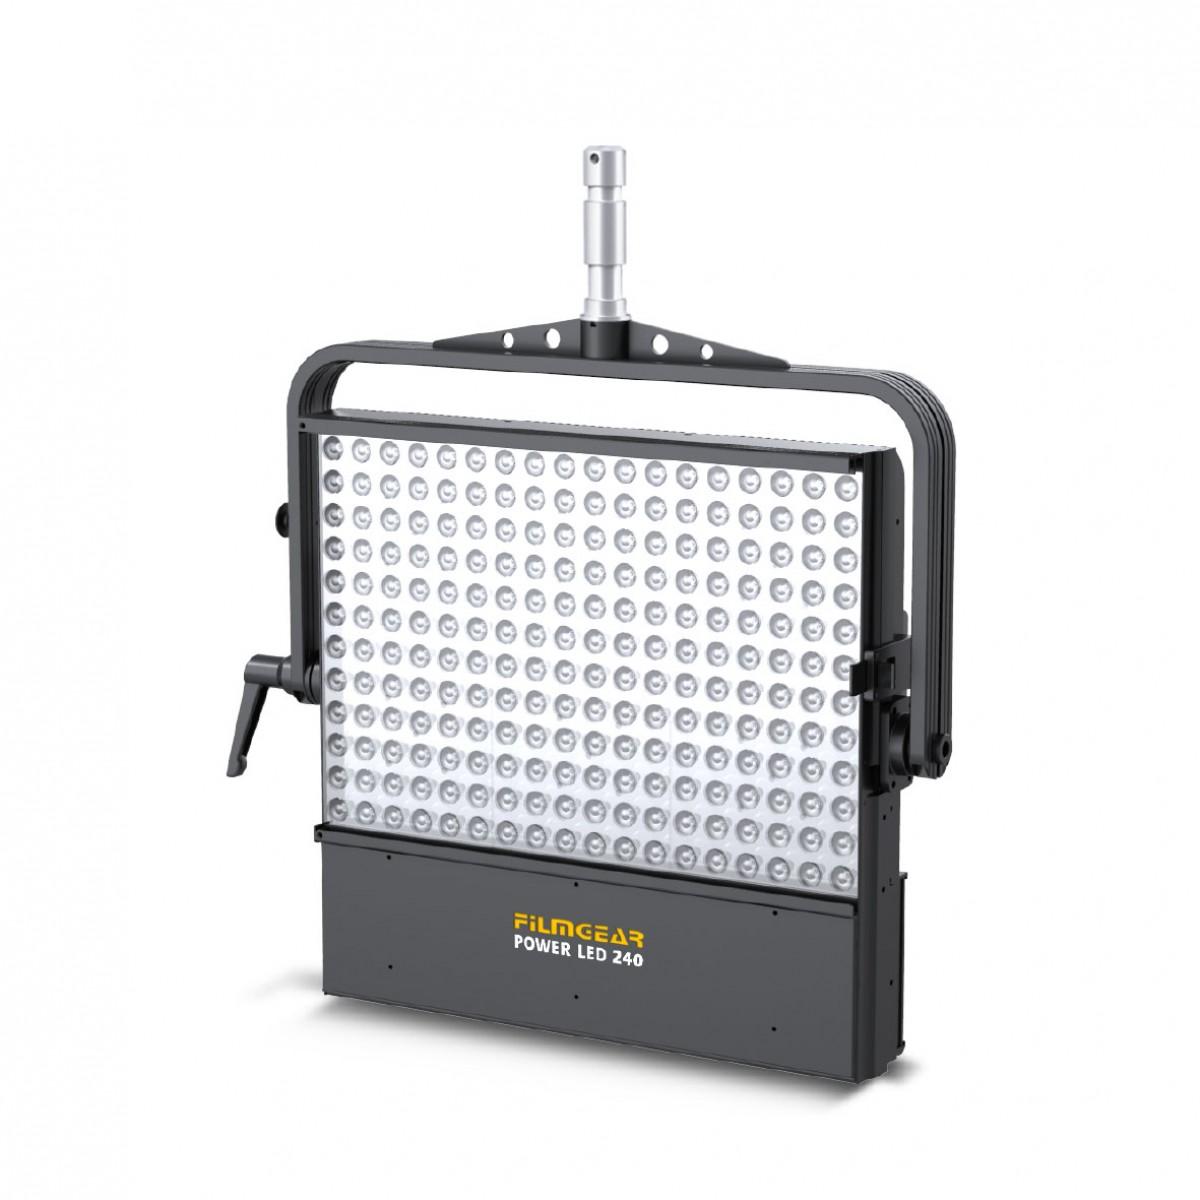 Power LED 240-1200x1200.jpg